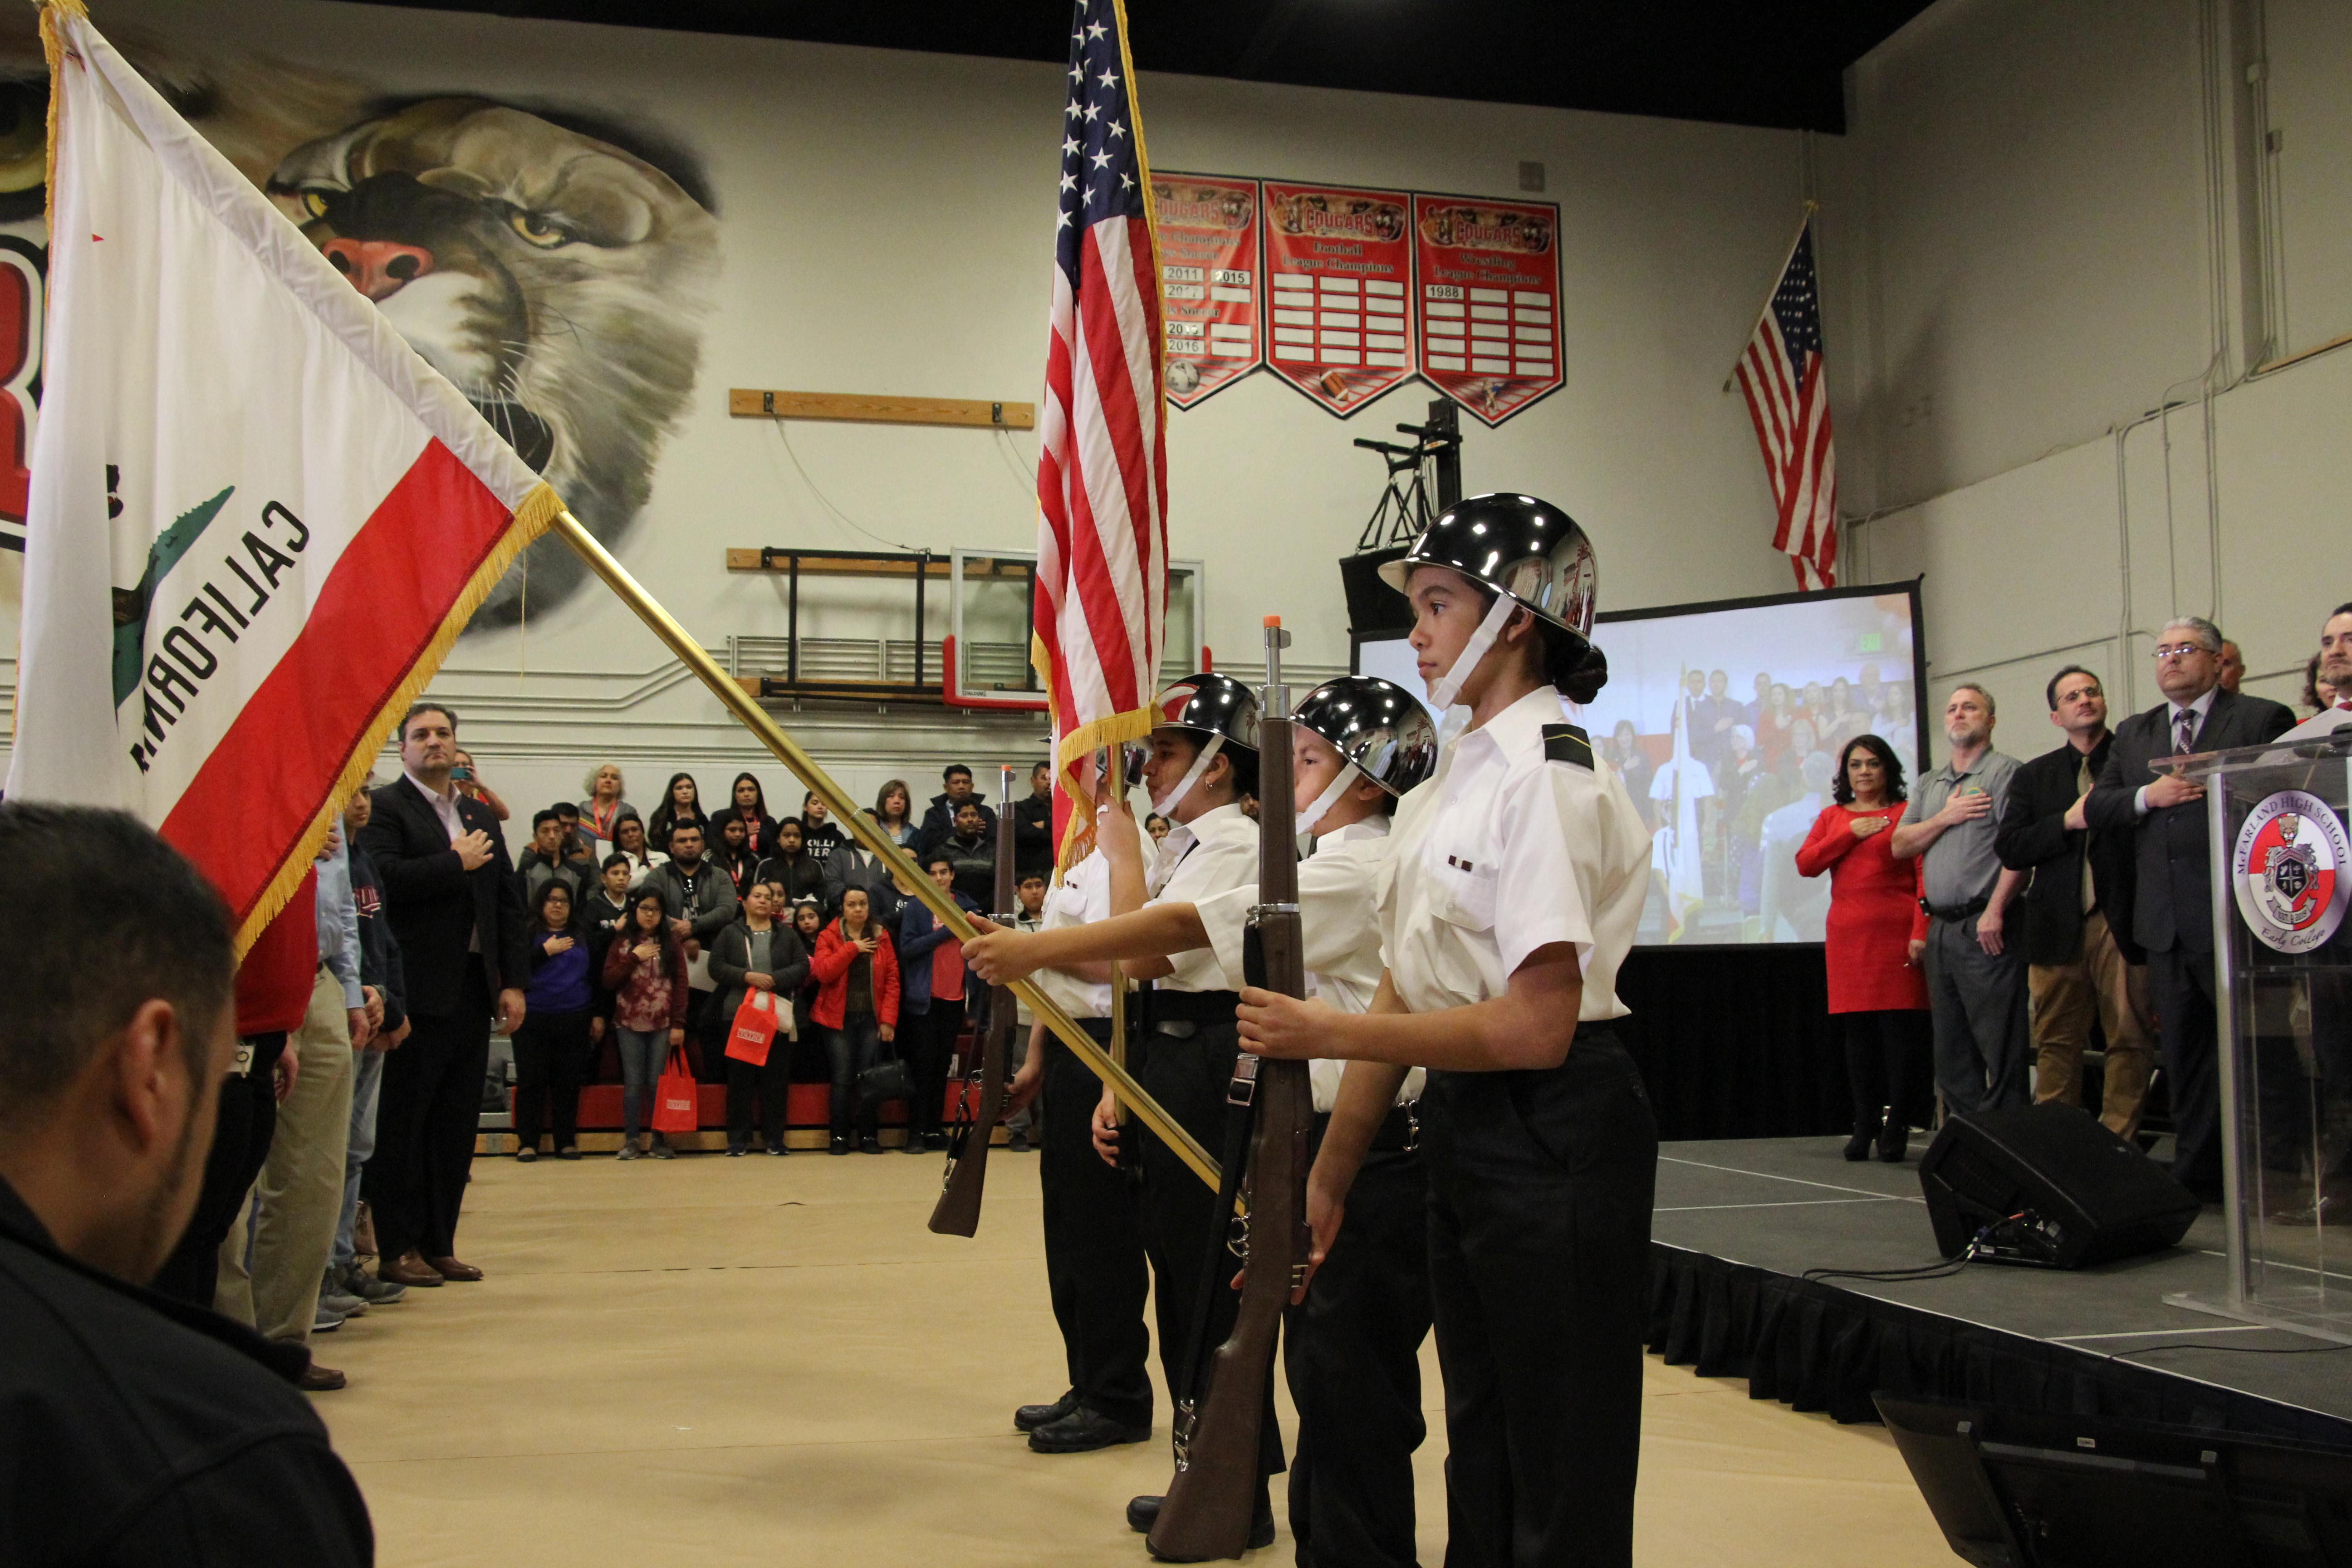 McFarland children holding flags